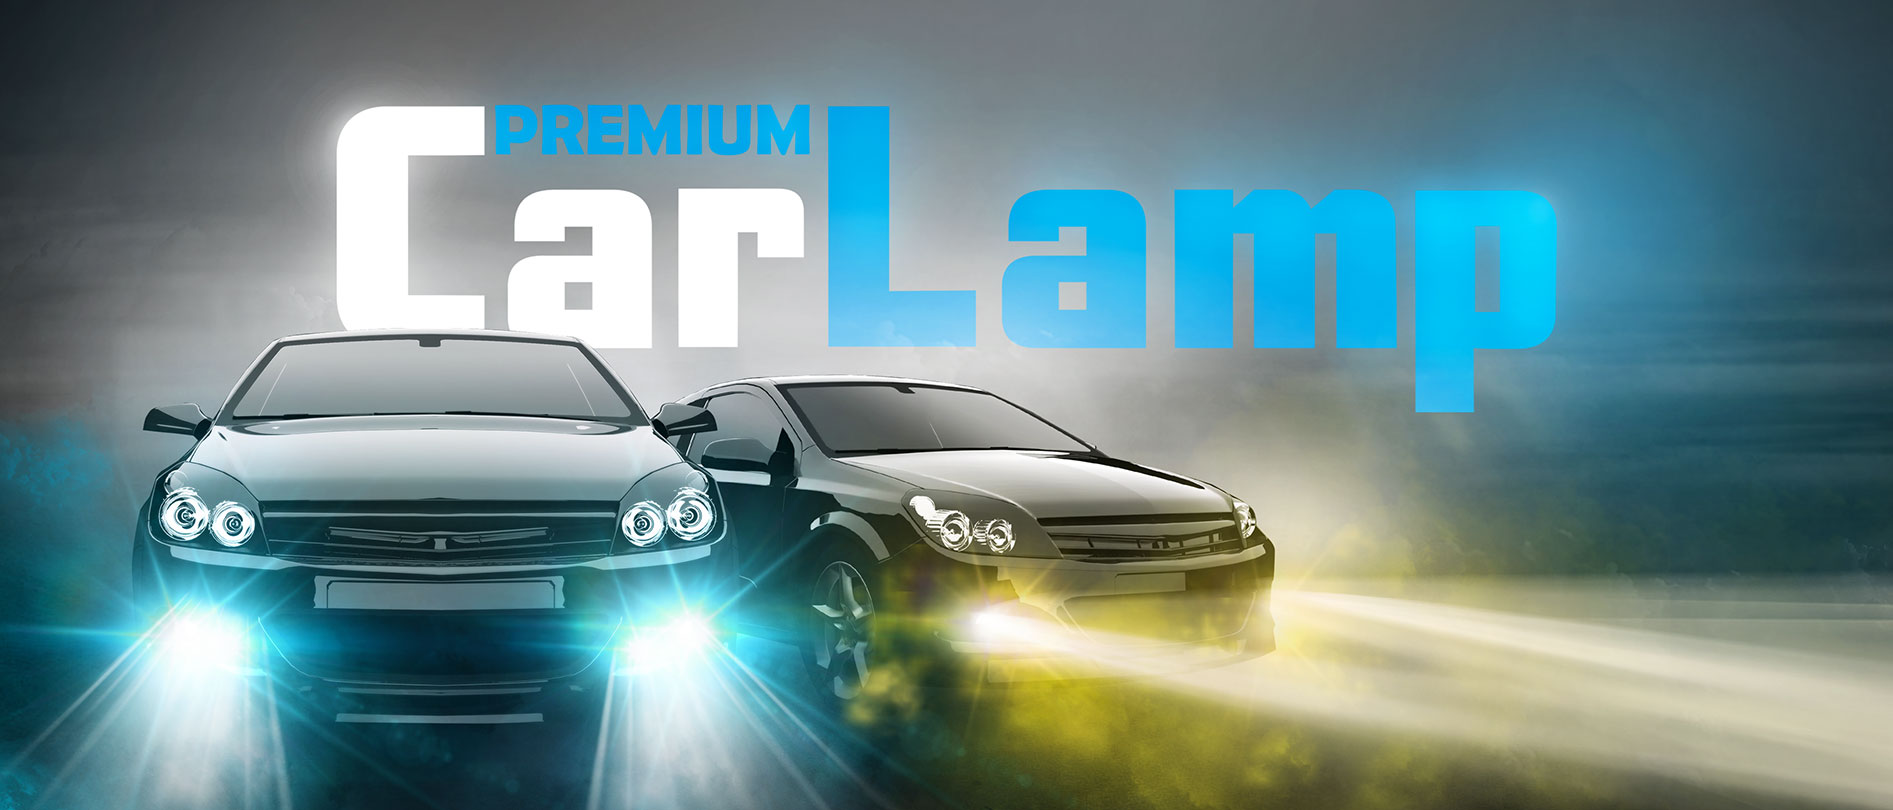 carlamp produkty